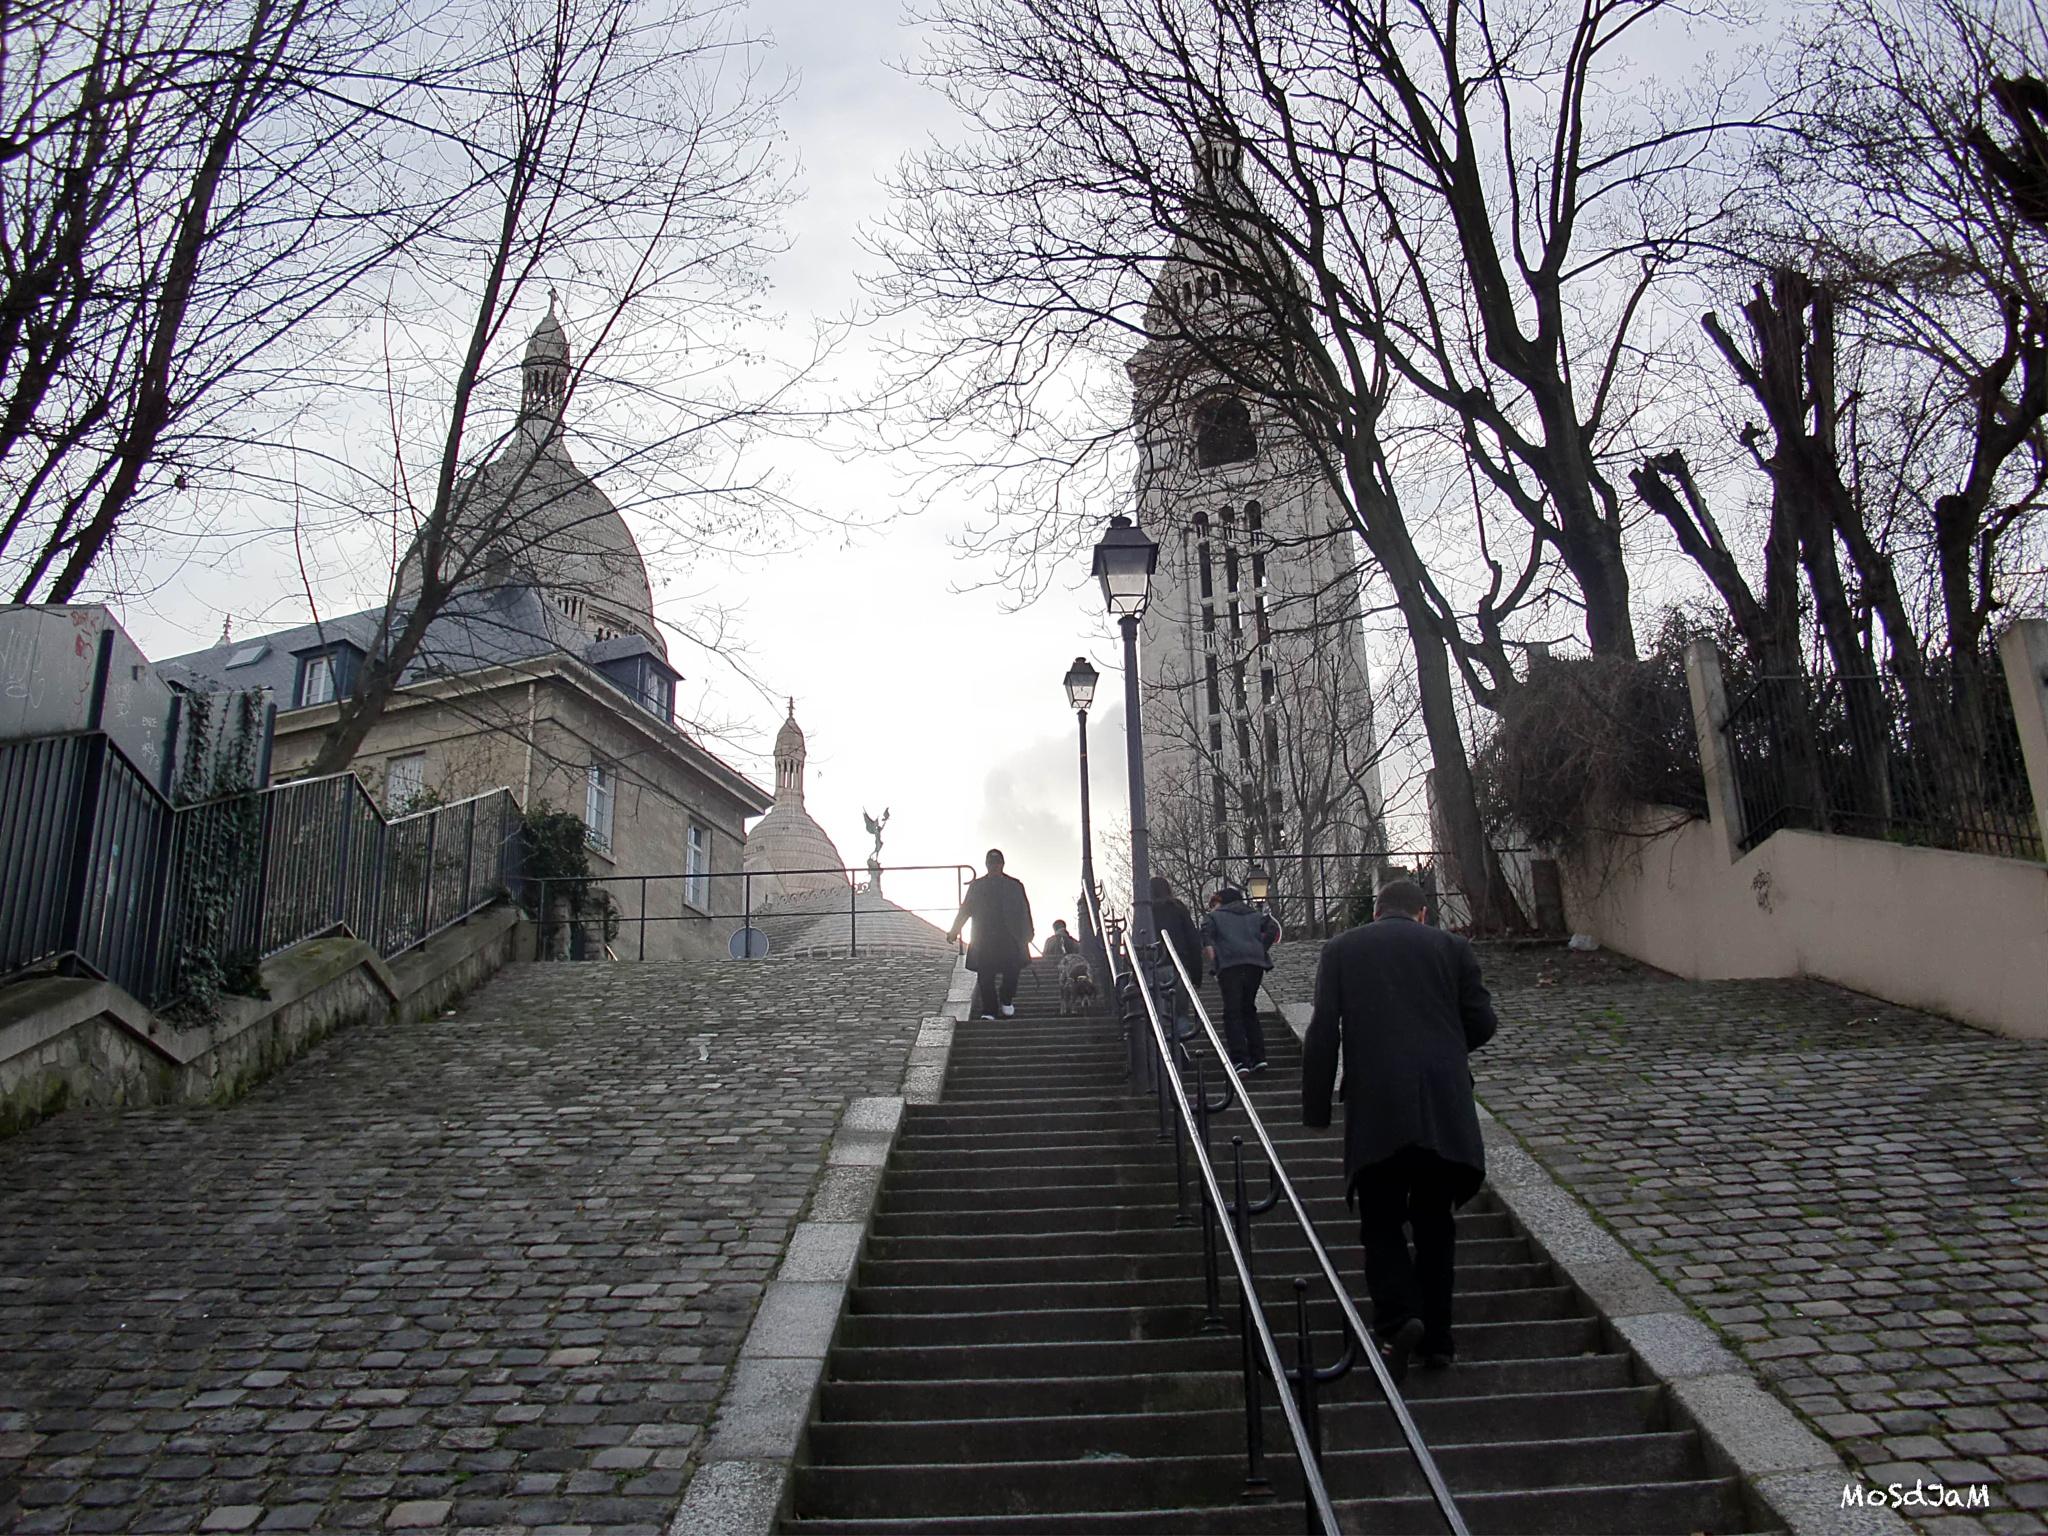 Montmartre stairways, Paris by MosDjam